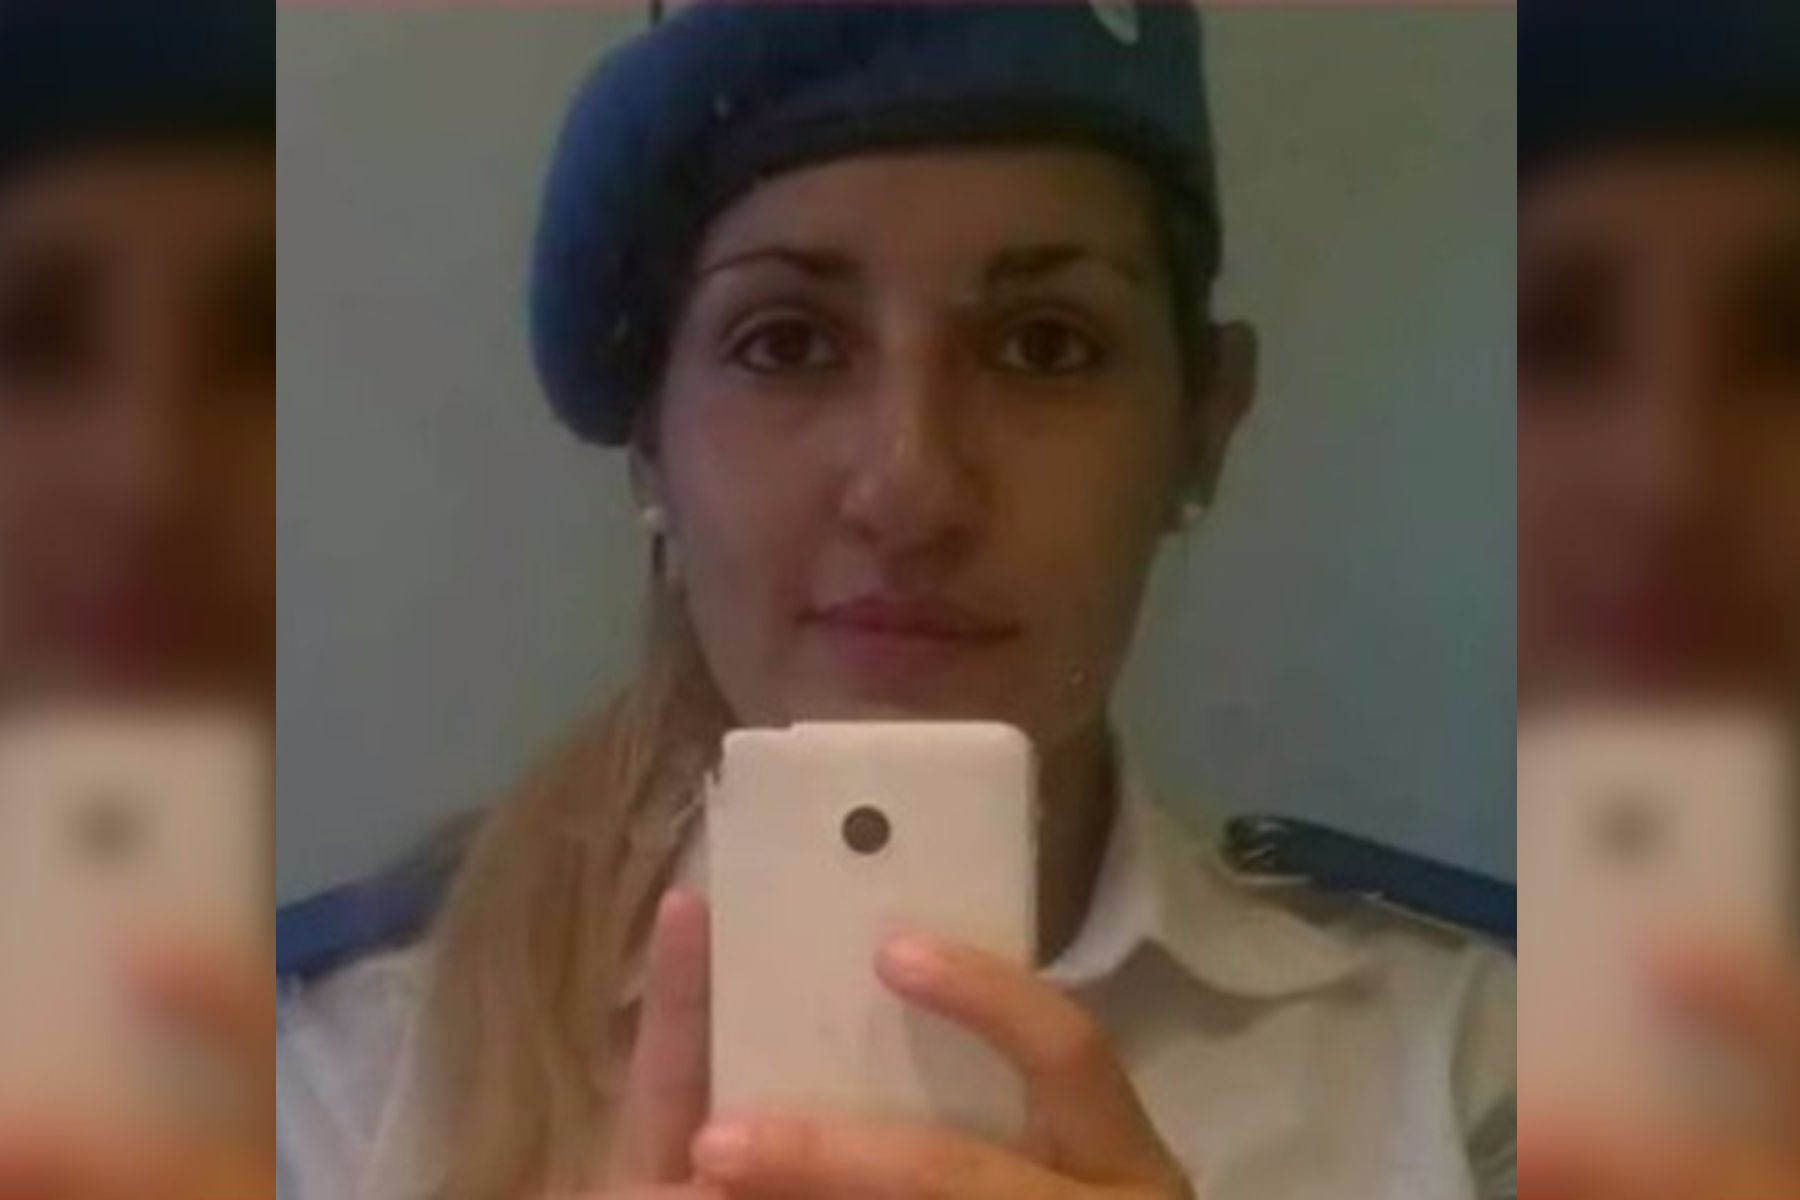 Un jefe policial mató a una oficial durante una práctica de tiro